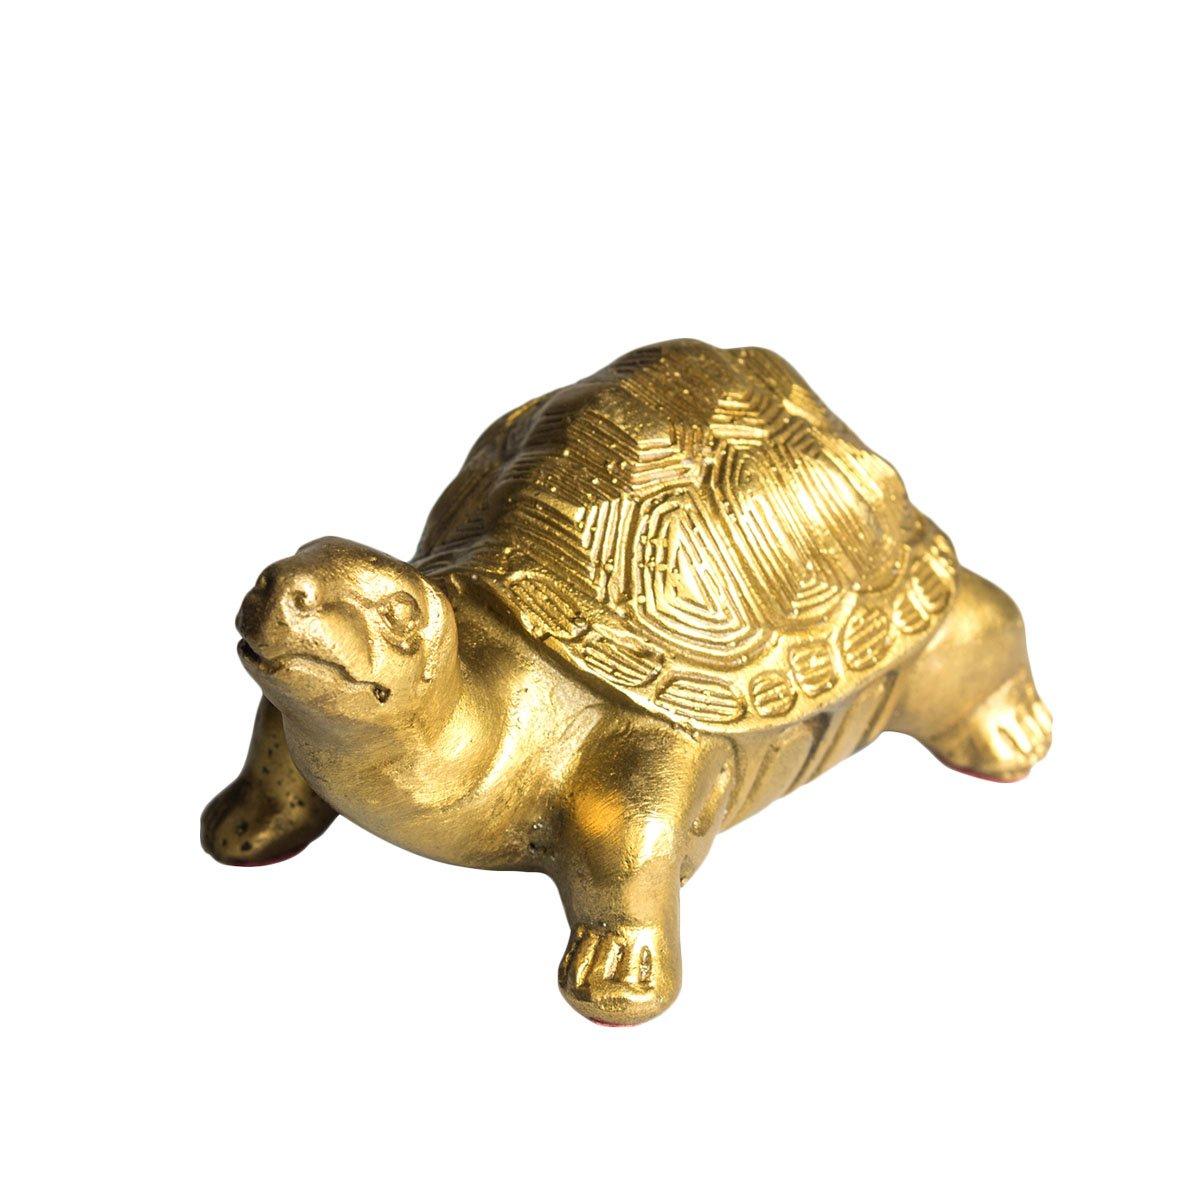 Brass Millennium Turtle Statue Home Decorative Collection